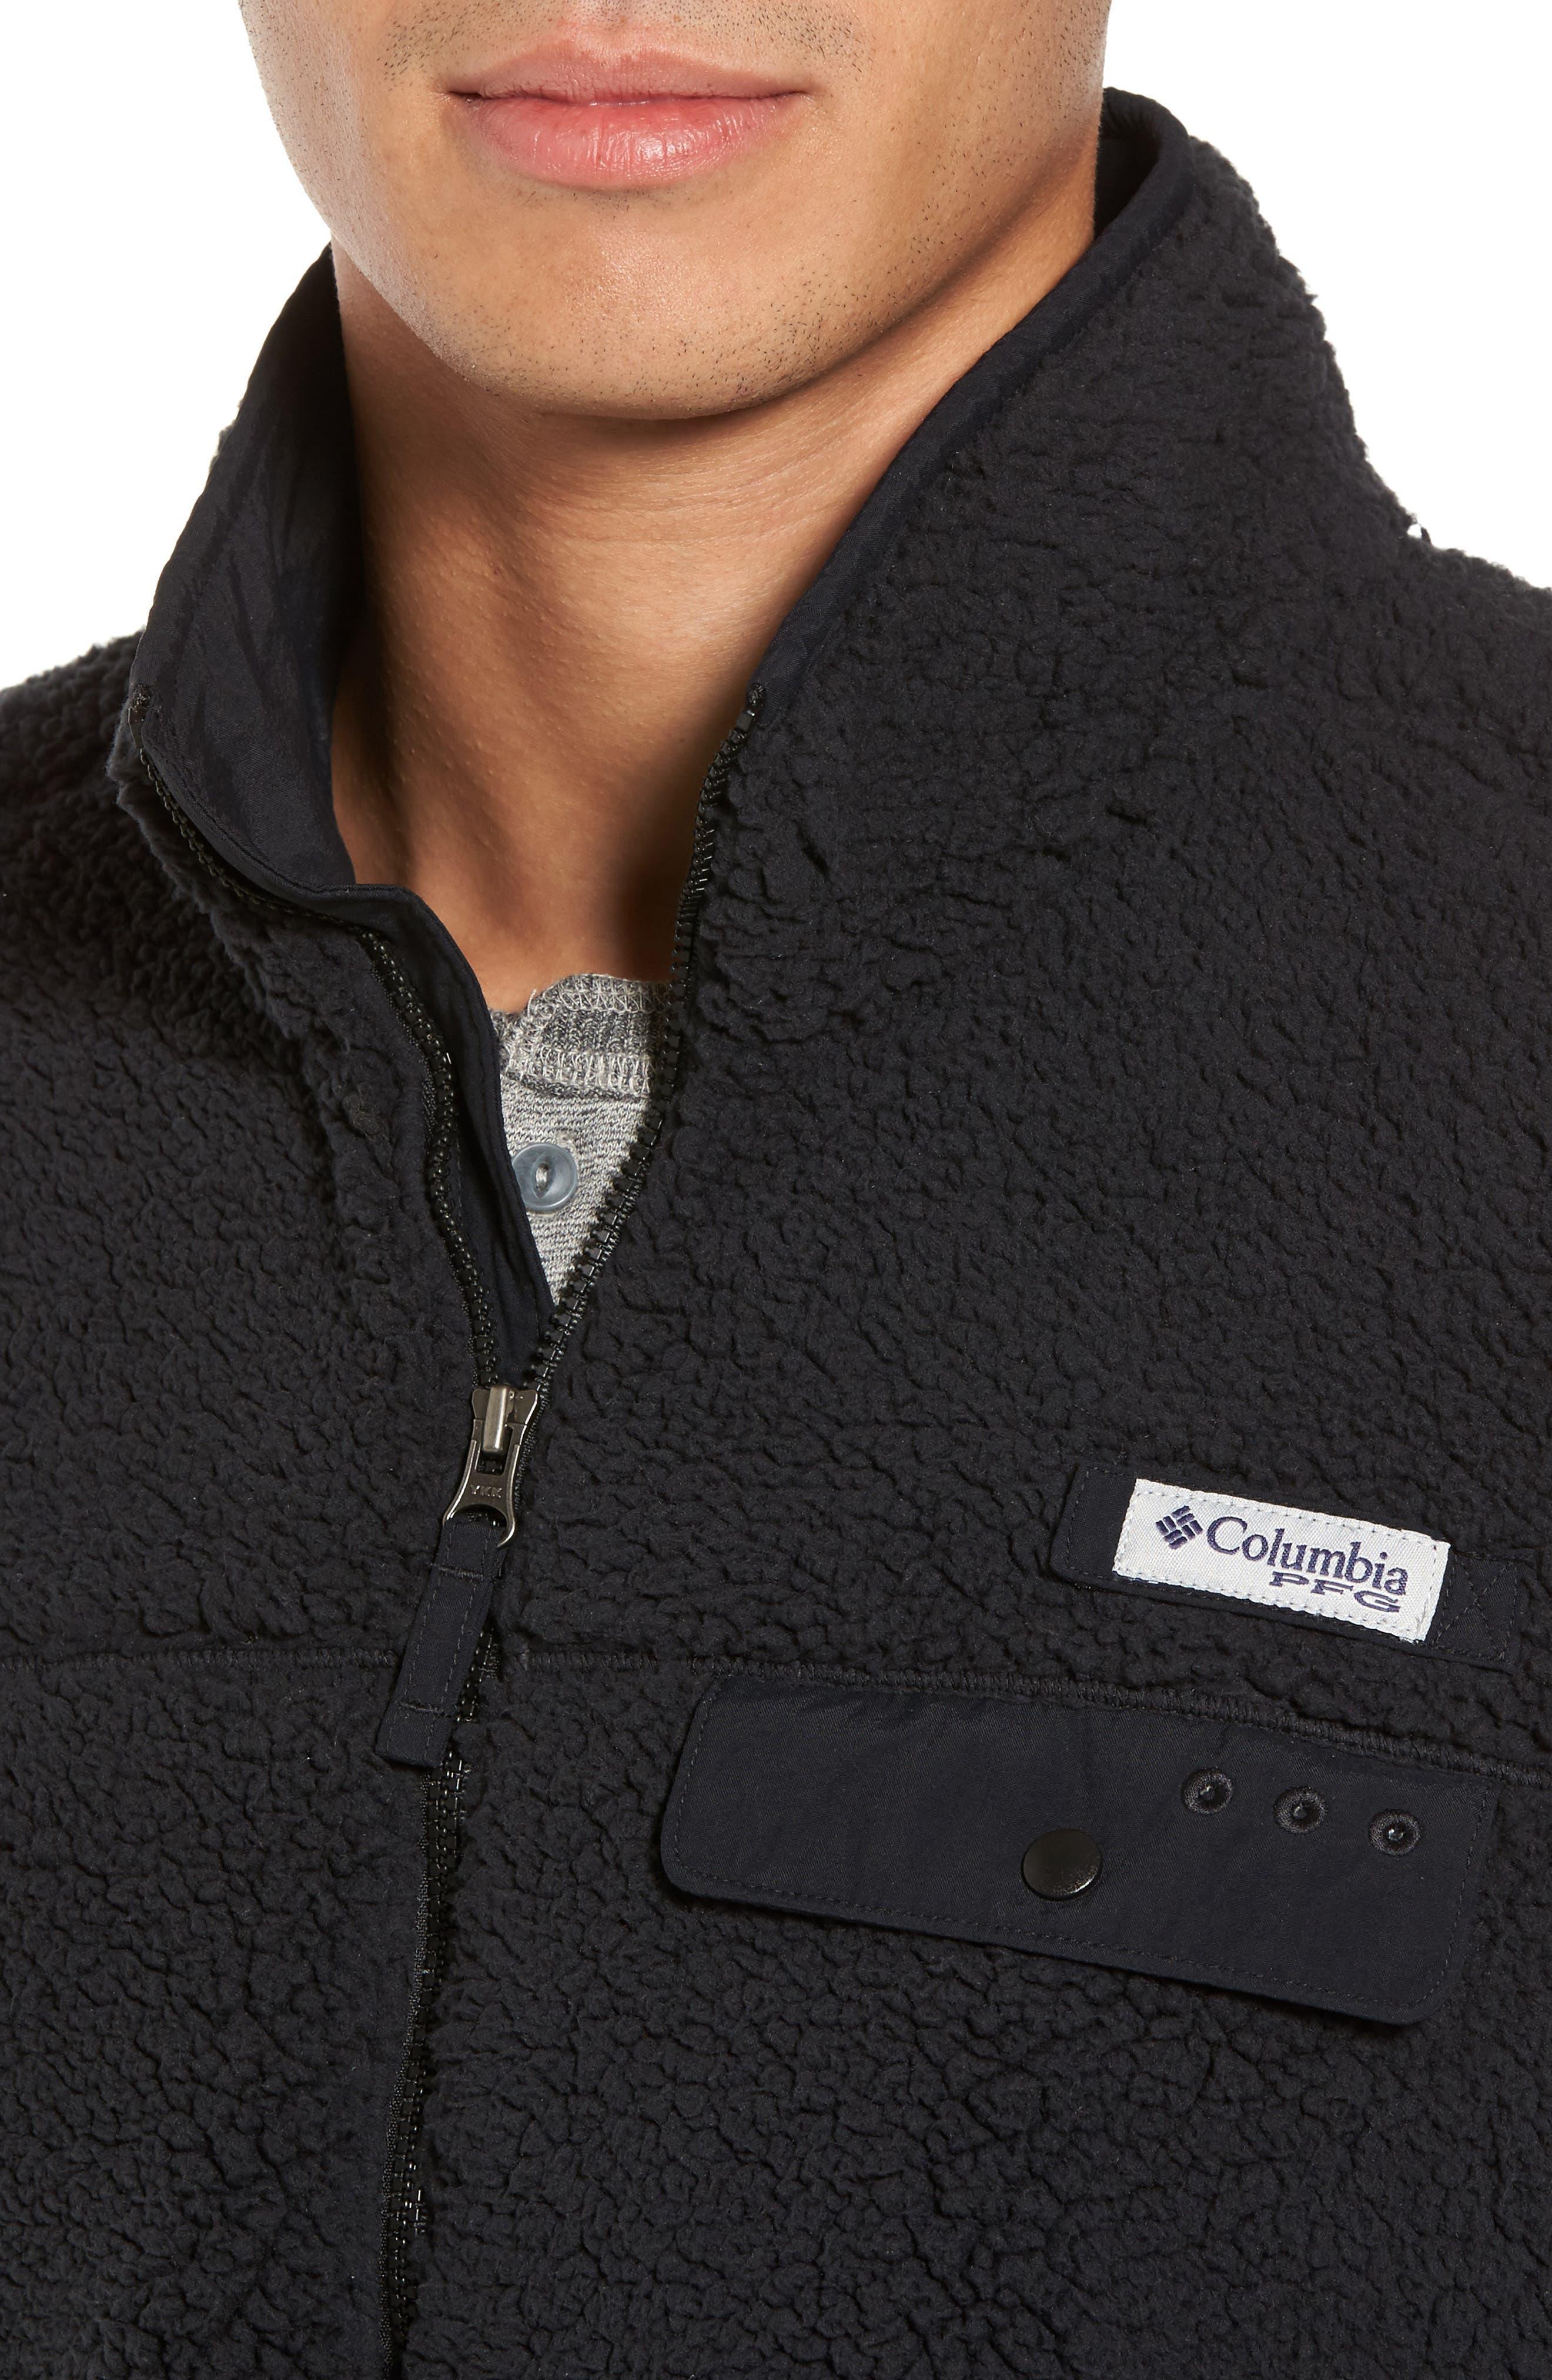 Sportswear Harborside Heavyweight Fleece Vest,                             Alternate thumbnail 4, color,                             010